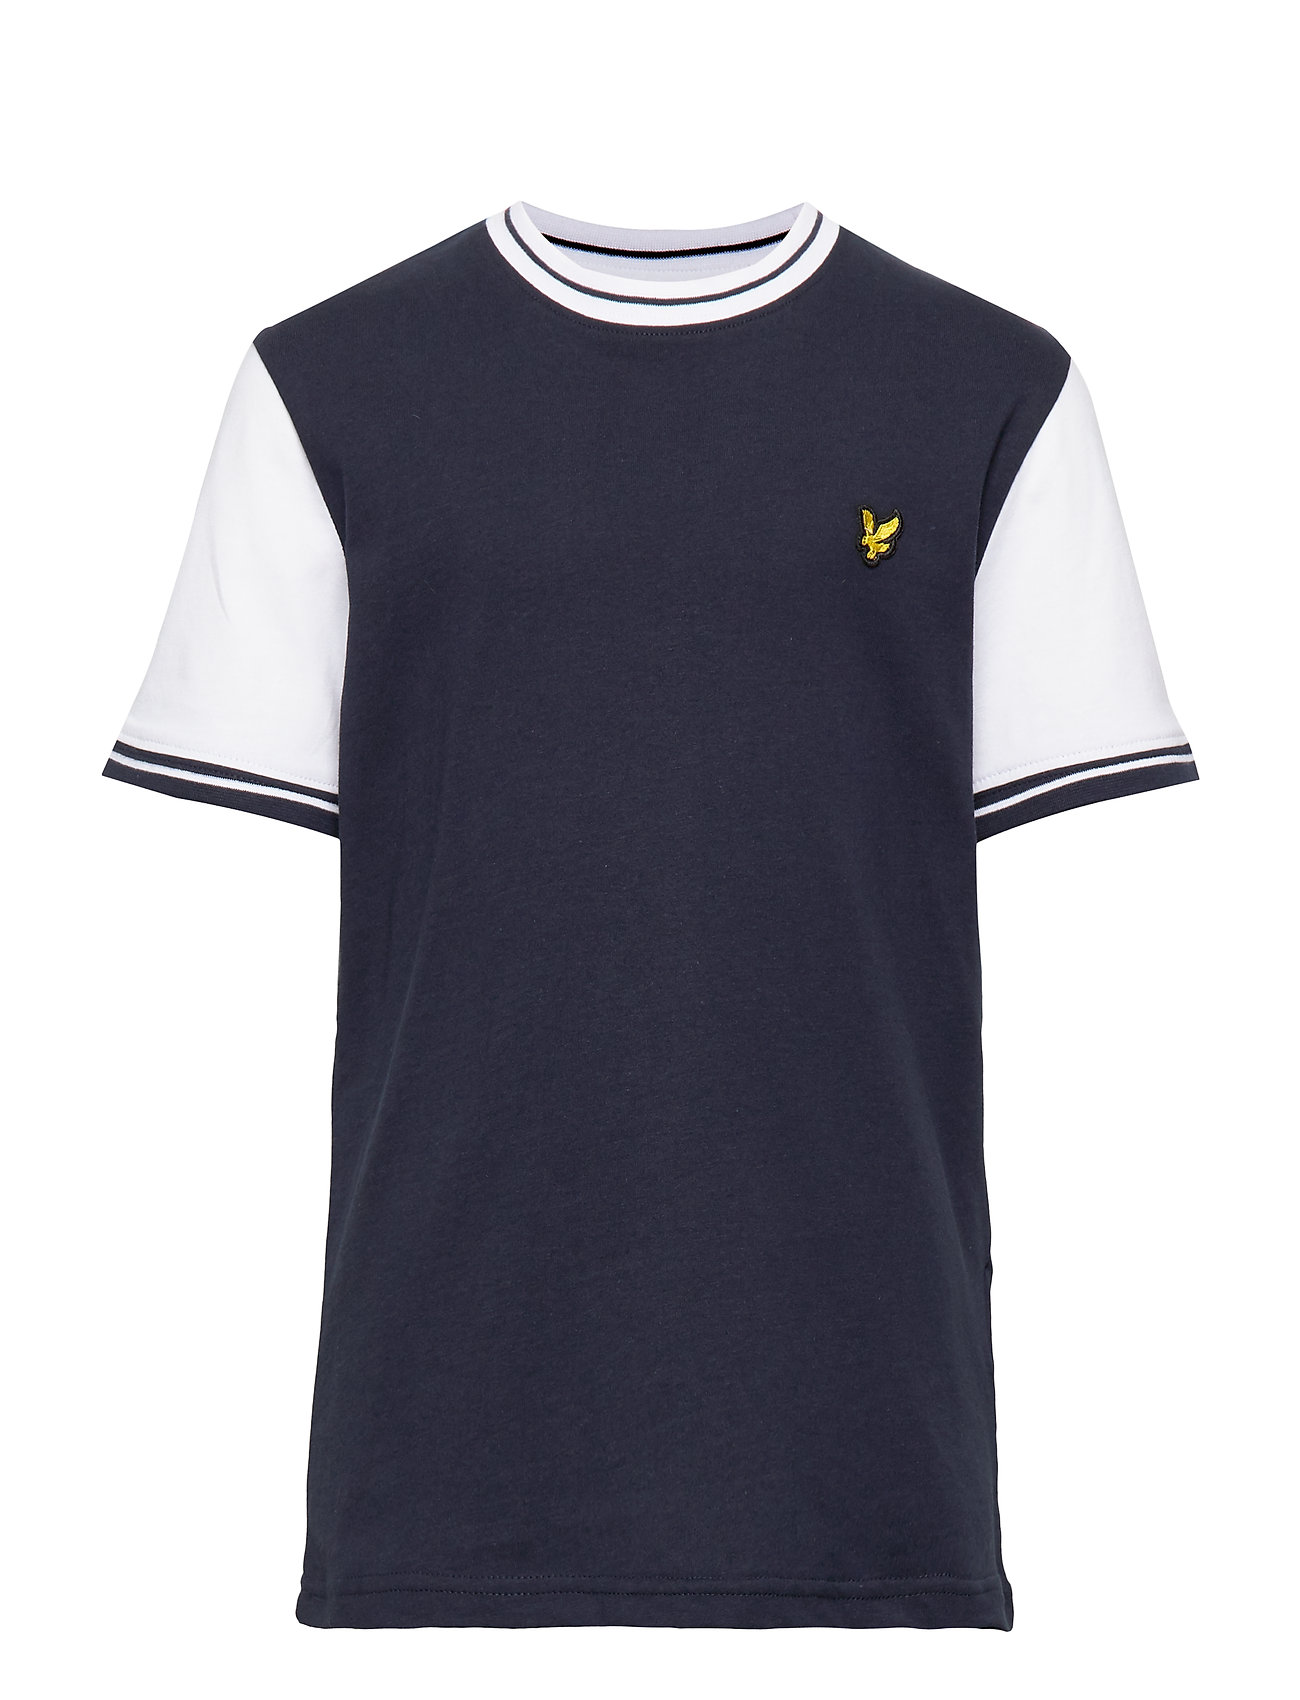 Lyle & Scott Junior Tipped T-Shirt - NAVY BLAZER